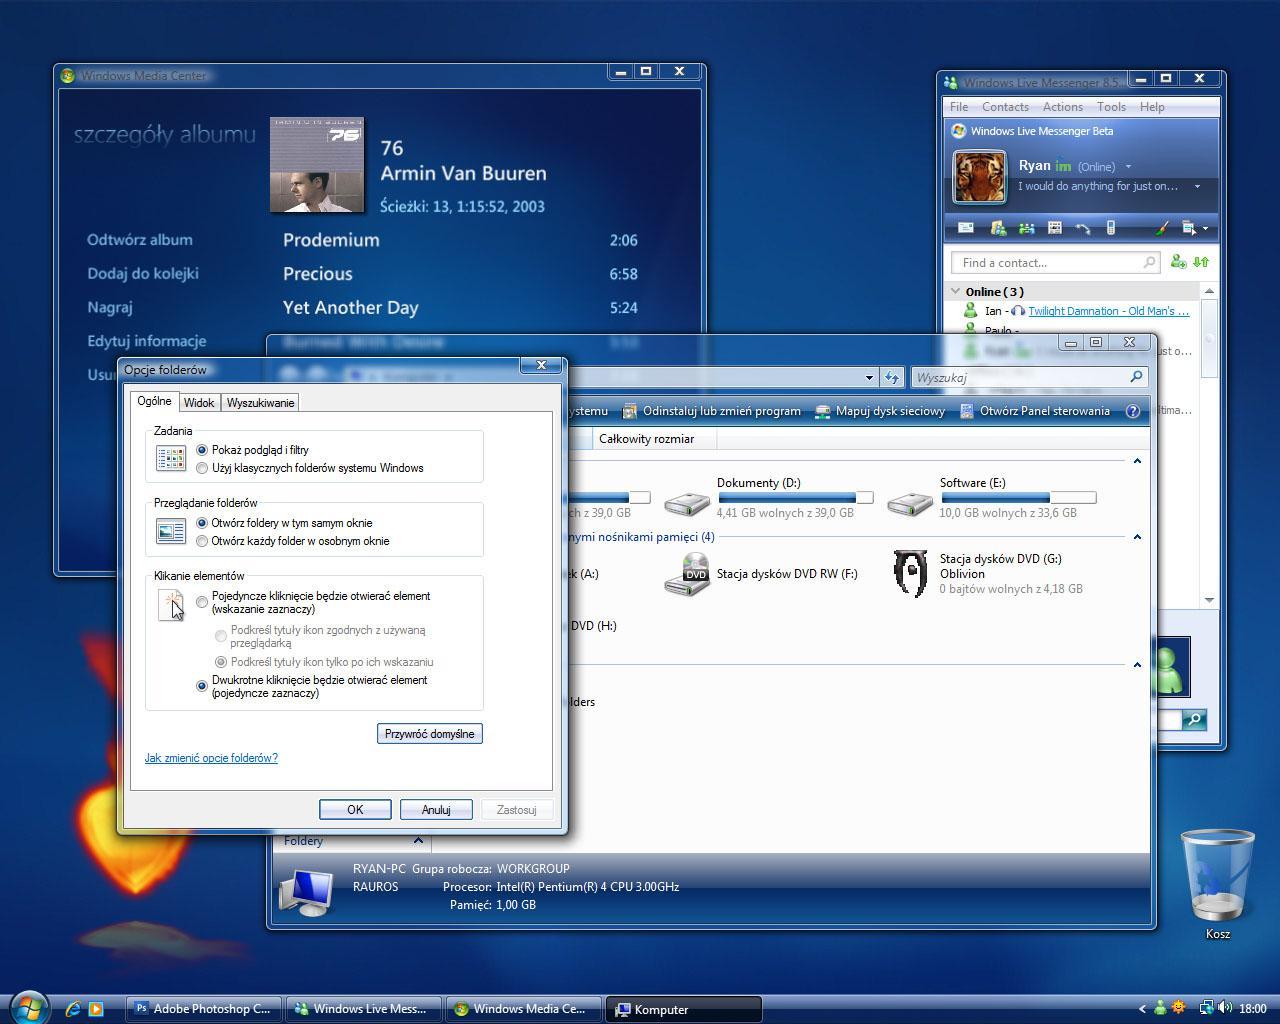 Media Center » MicrosoftPortal NET – Новости Windows 10